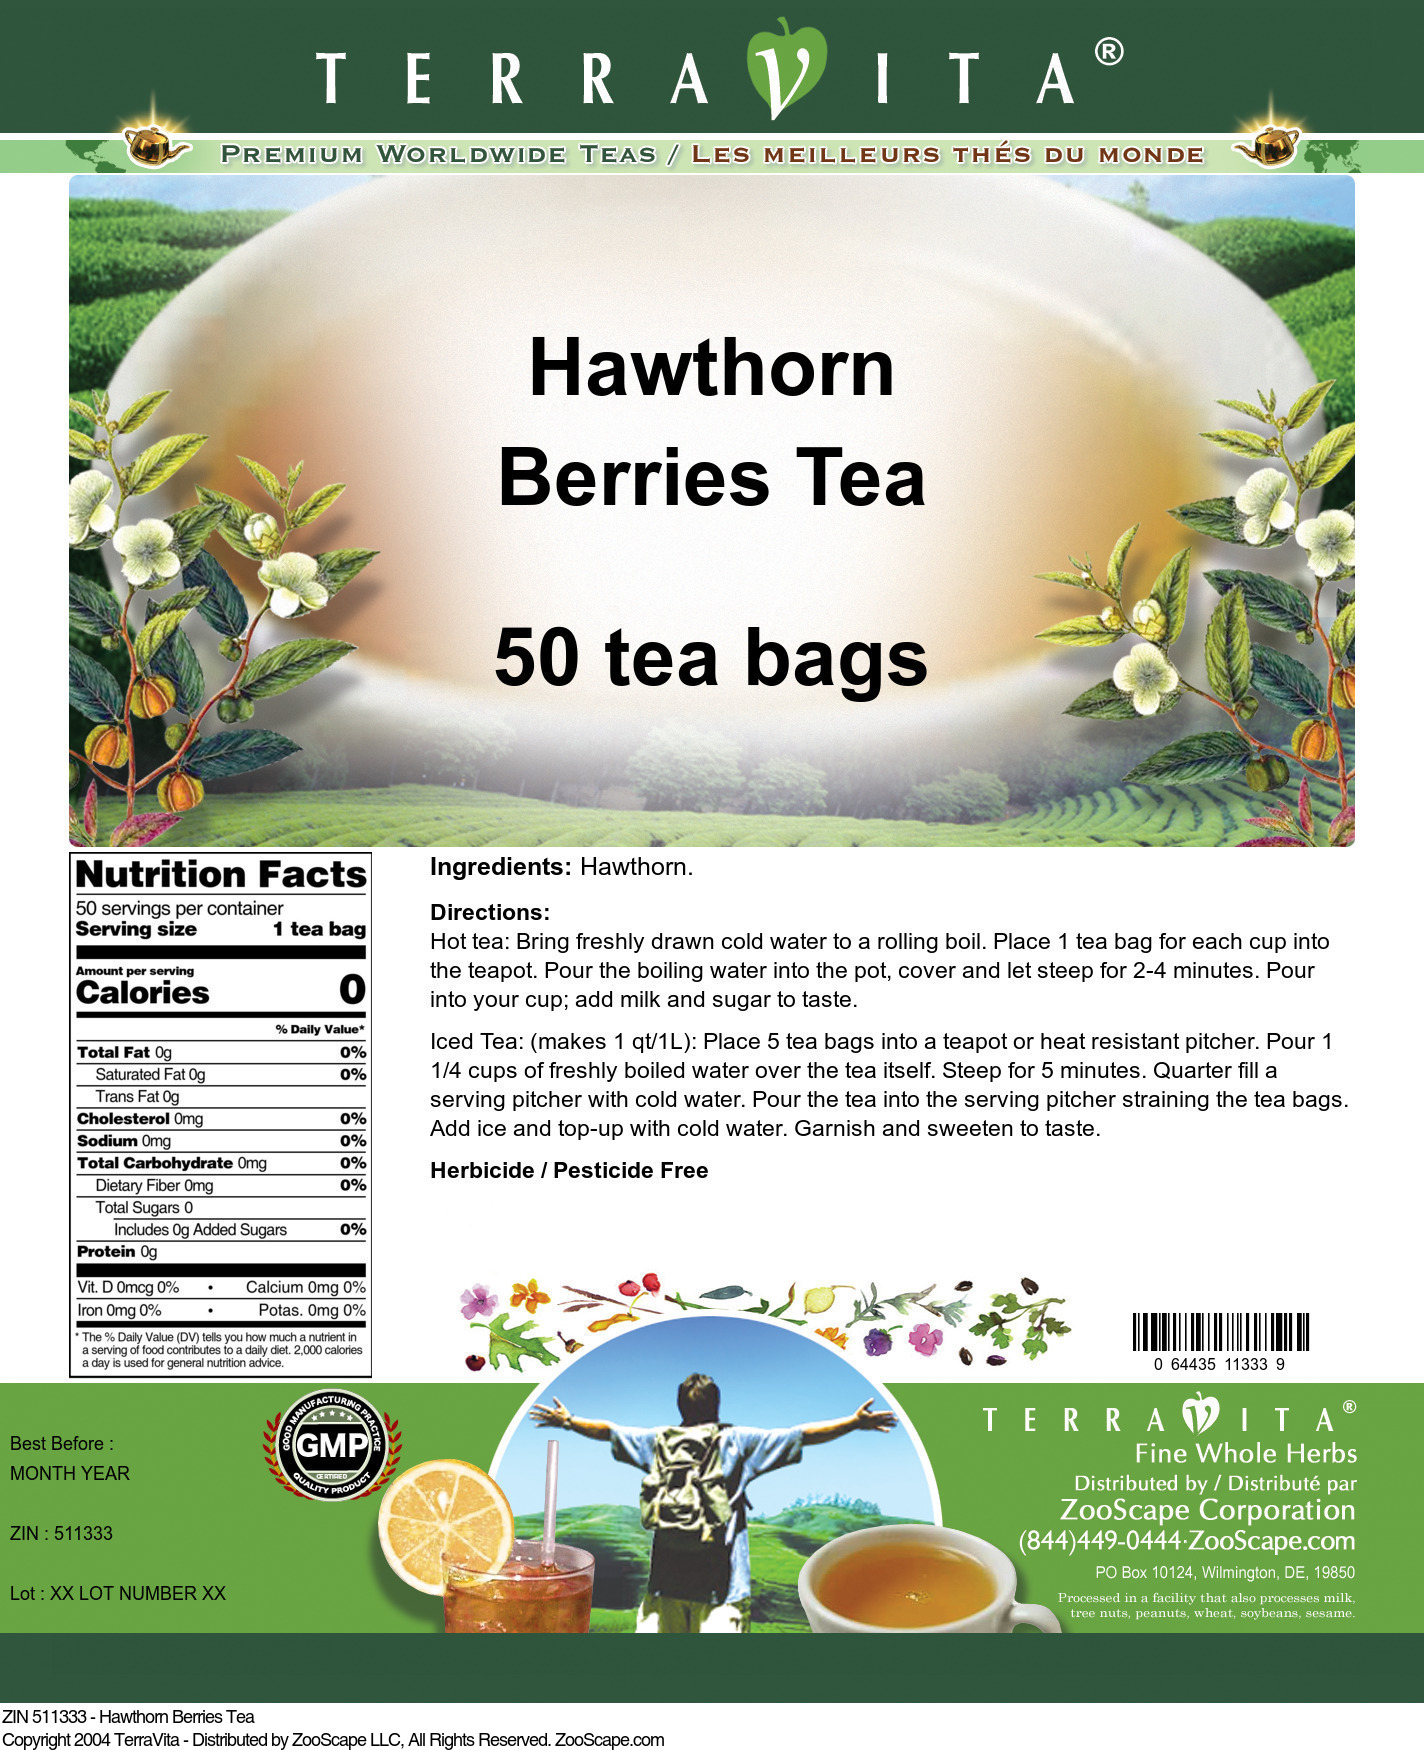 Hawthorn Berries Tea